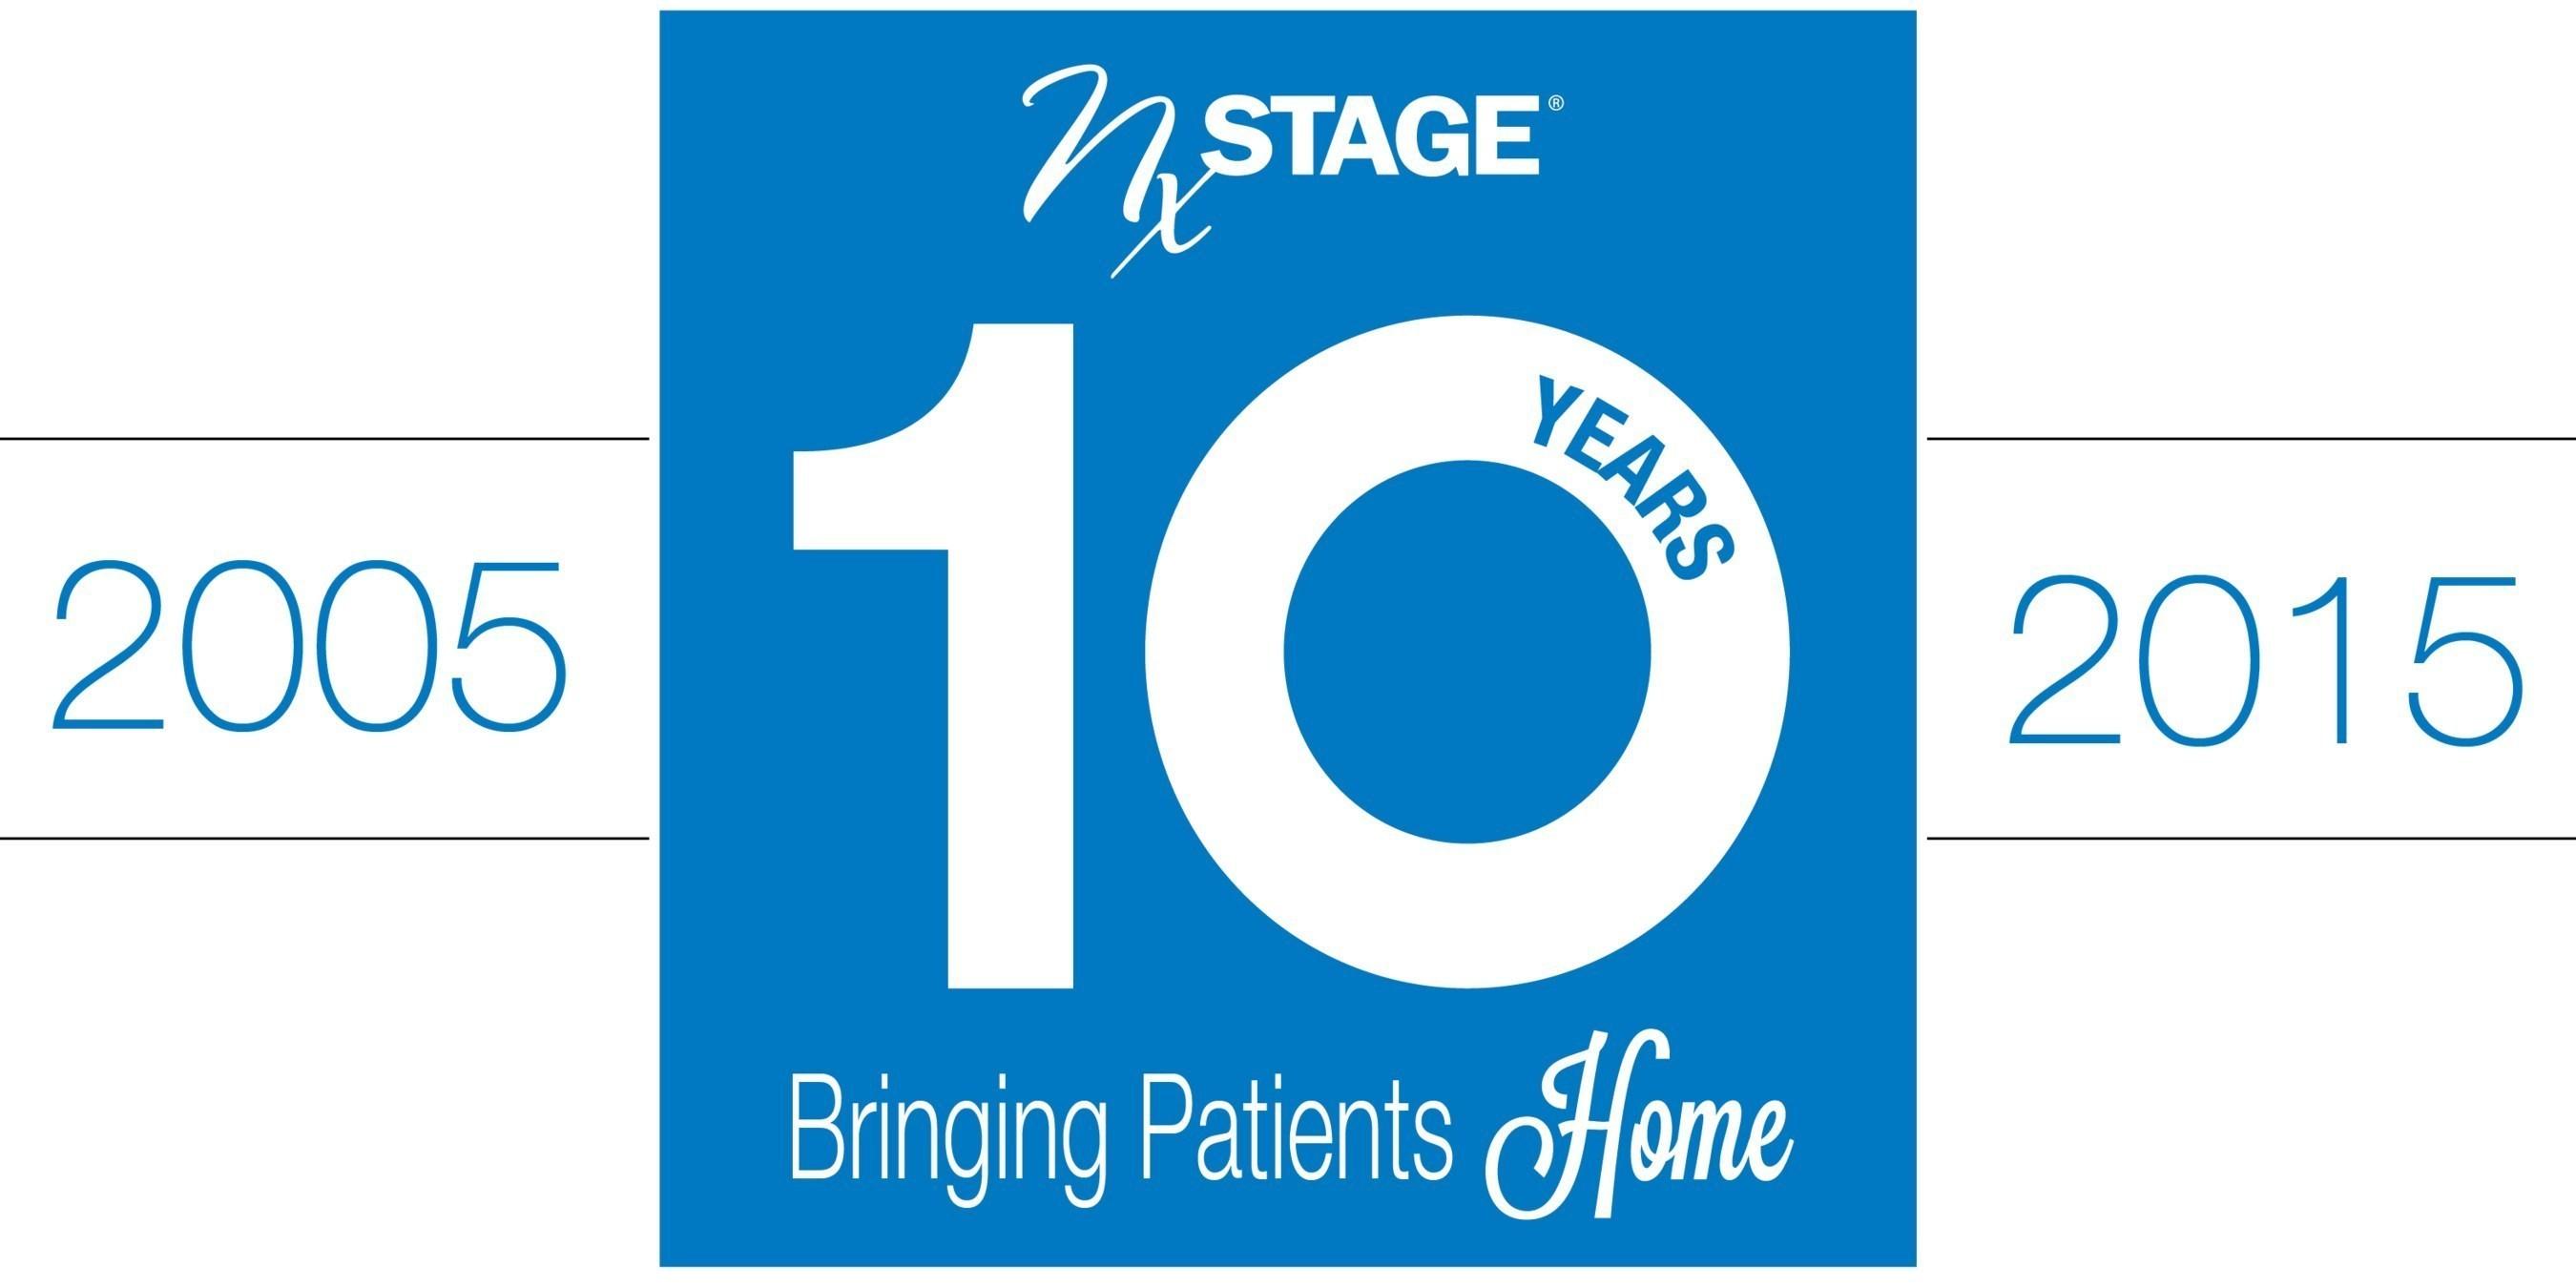 NxStage Celebrates 10th Anniversary